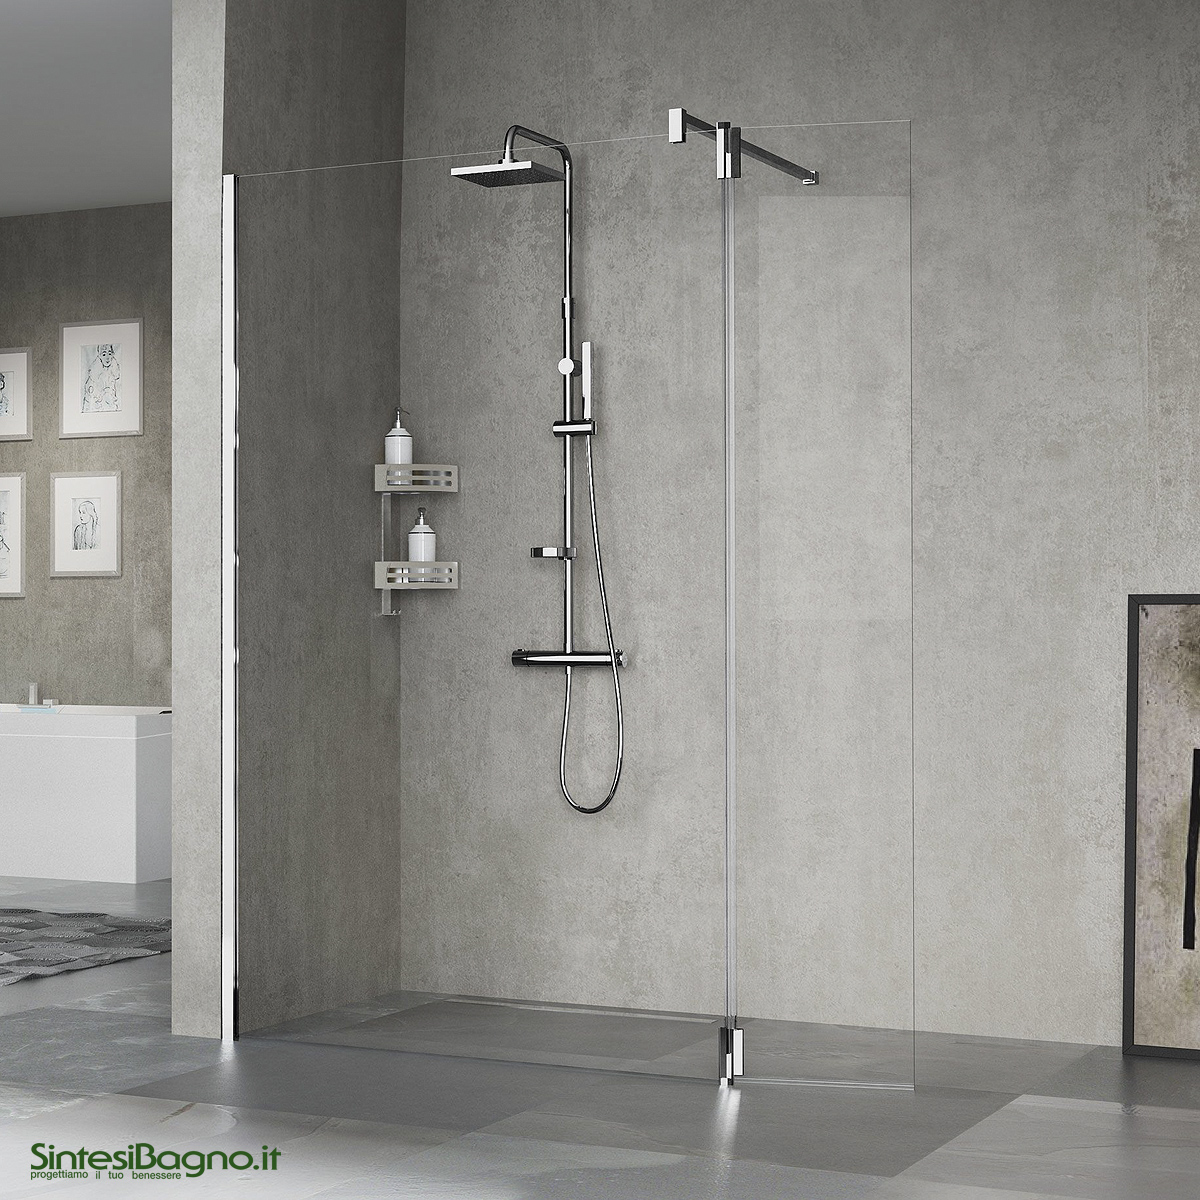 Colonna doccia attrezzata NOVELLINI serie EASY 2